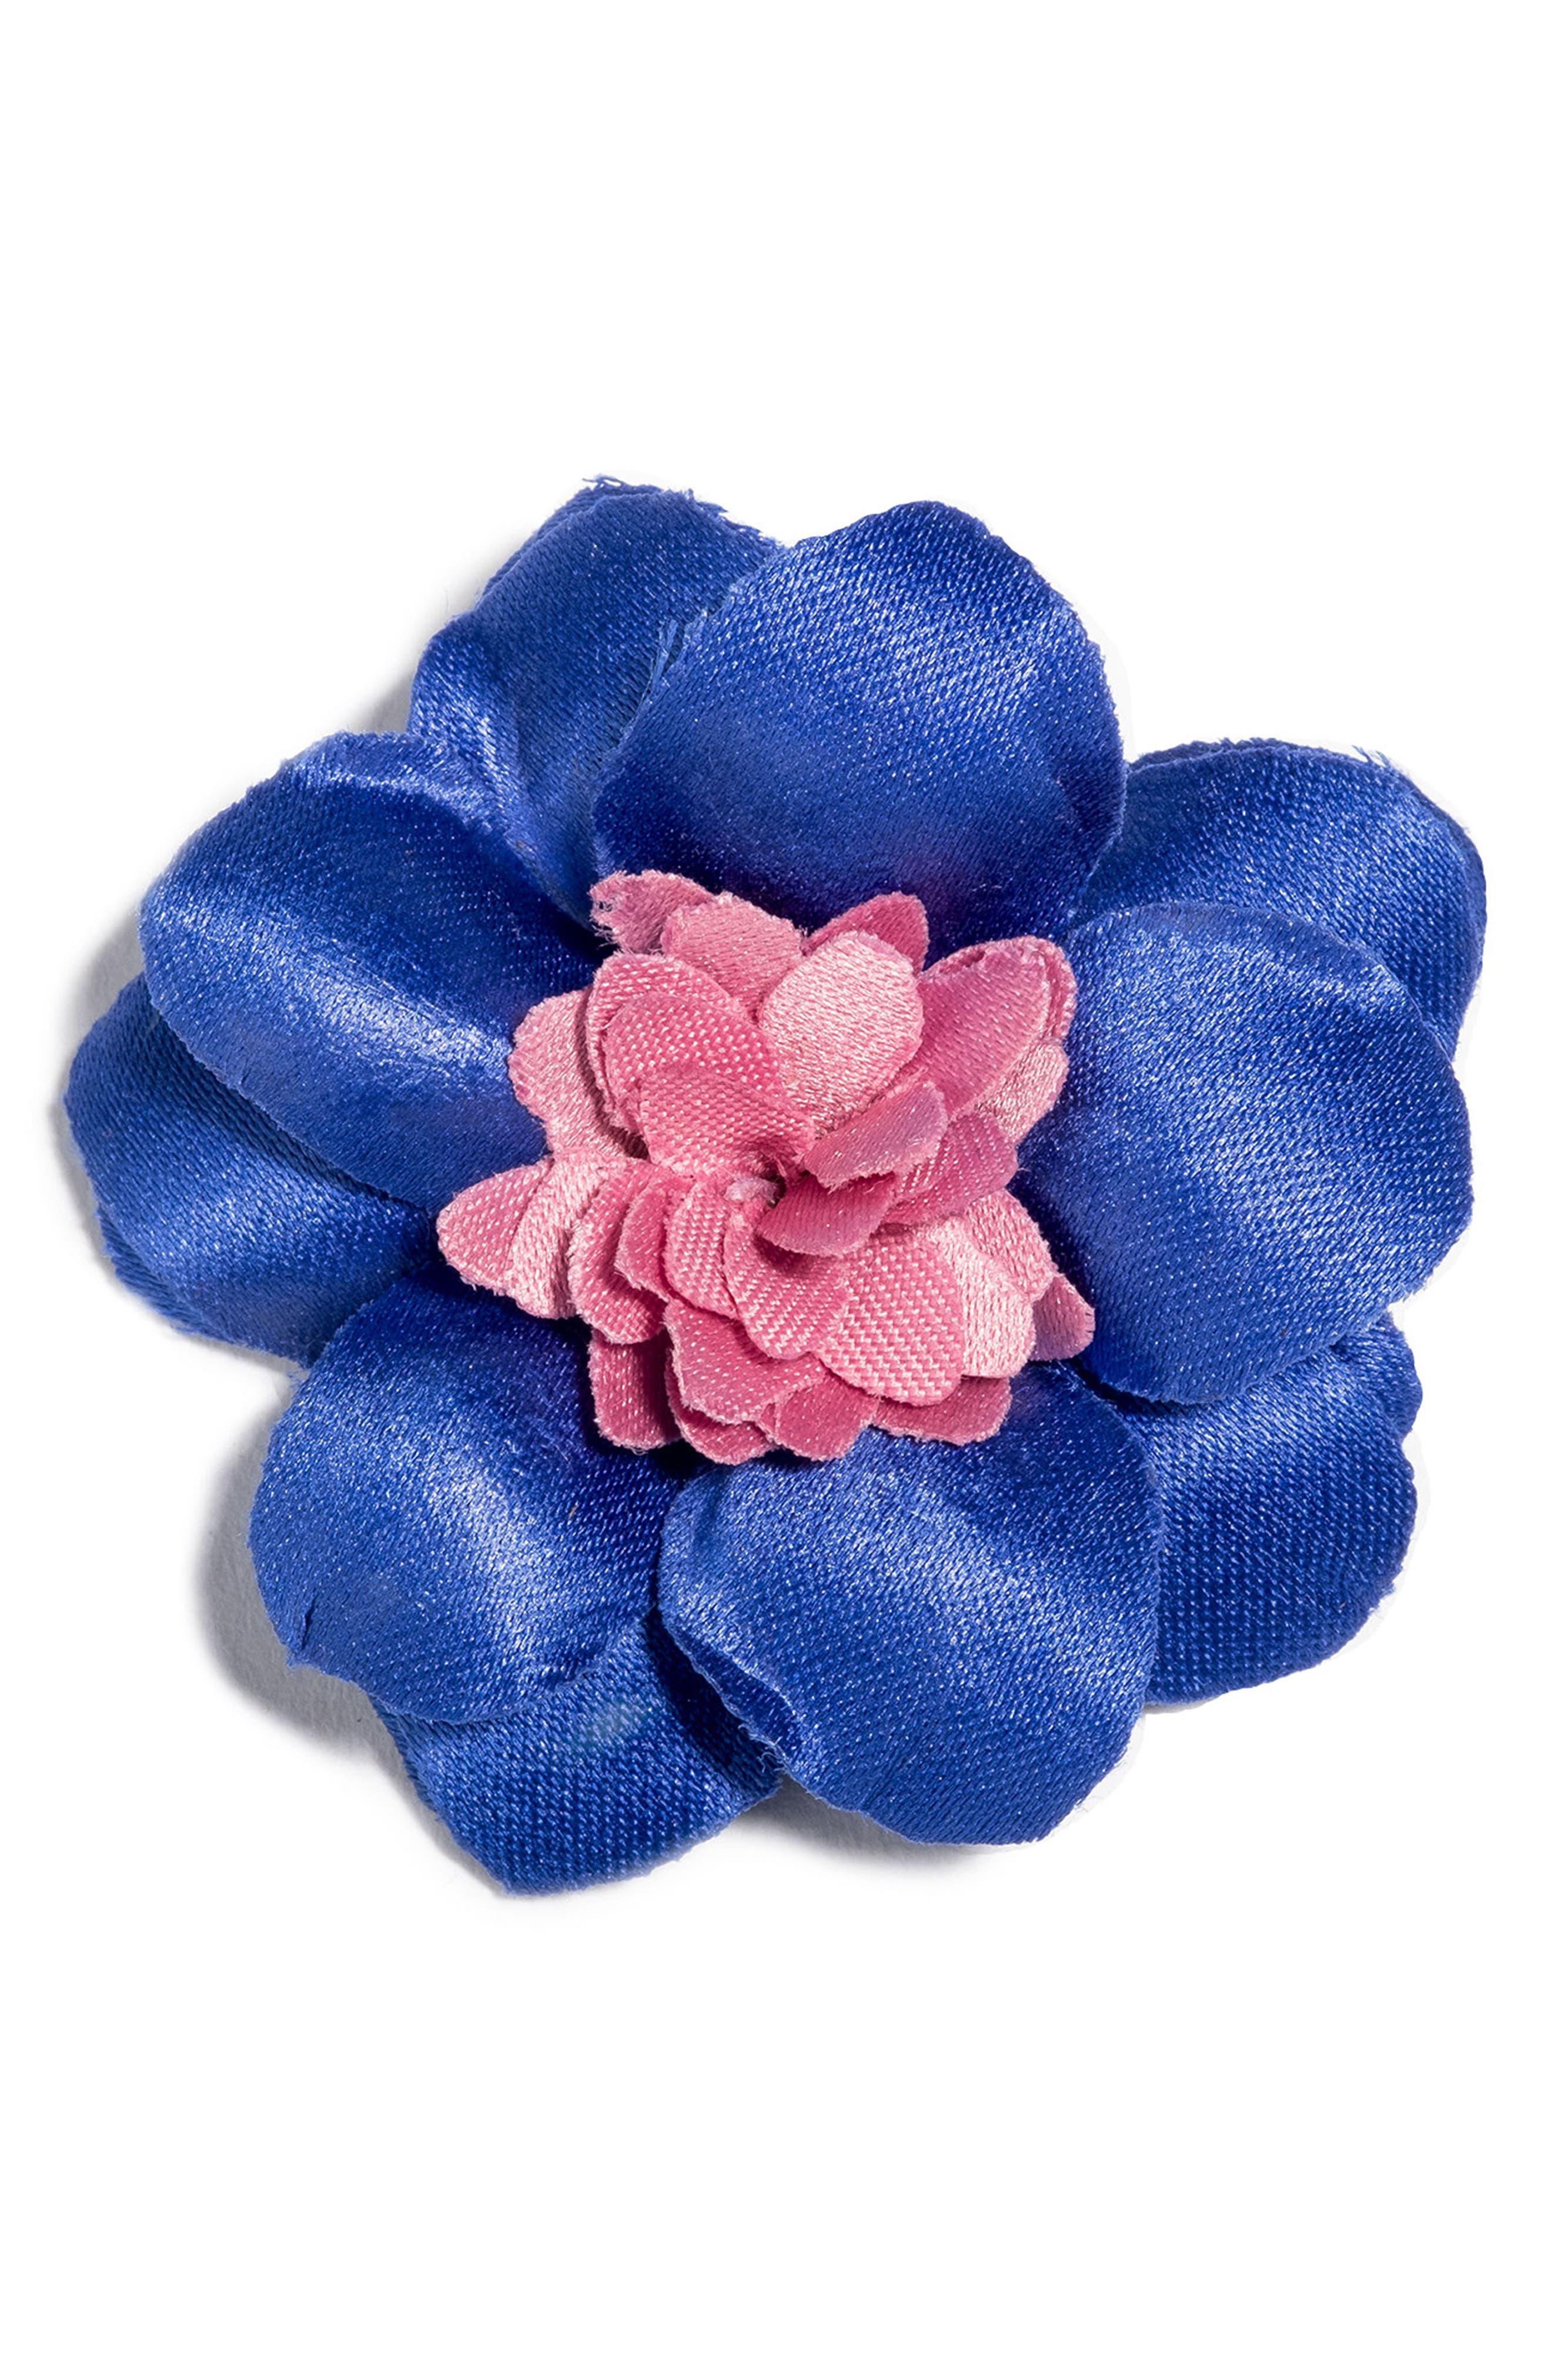 Henry Satin Lapel Flower,                             Main thumbnail 1, color,                             Blue